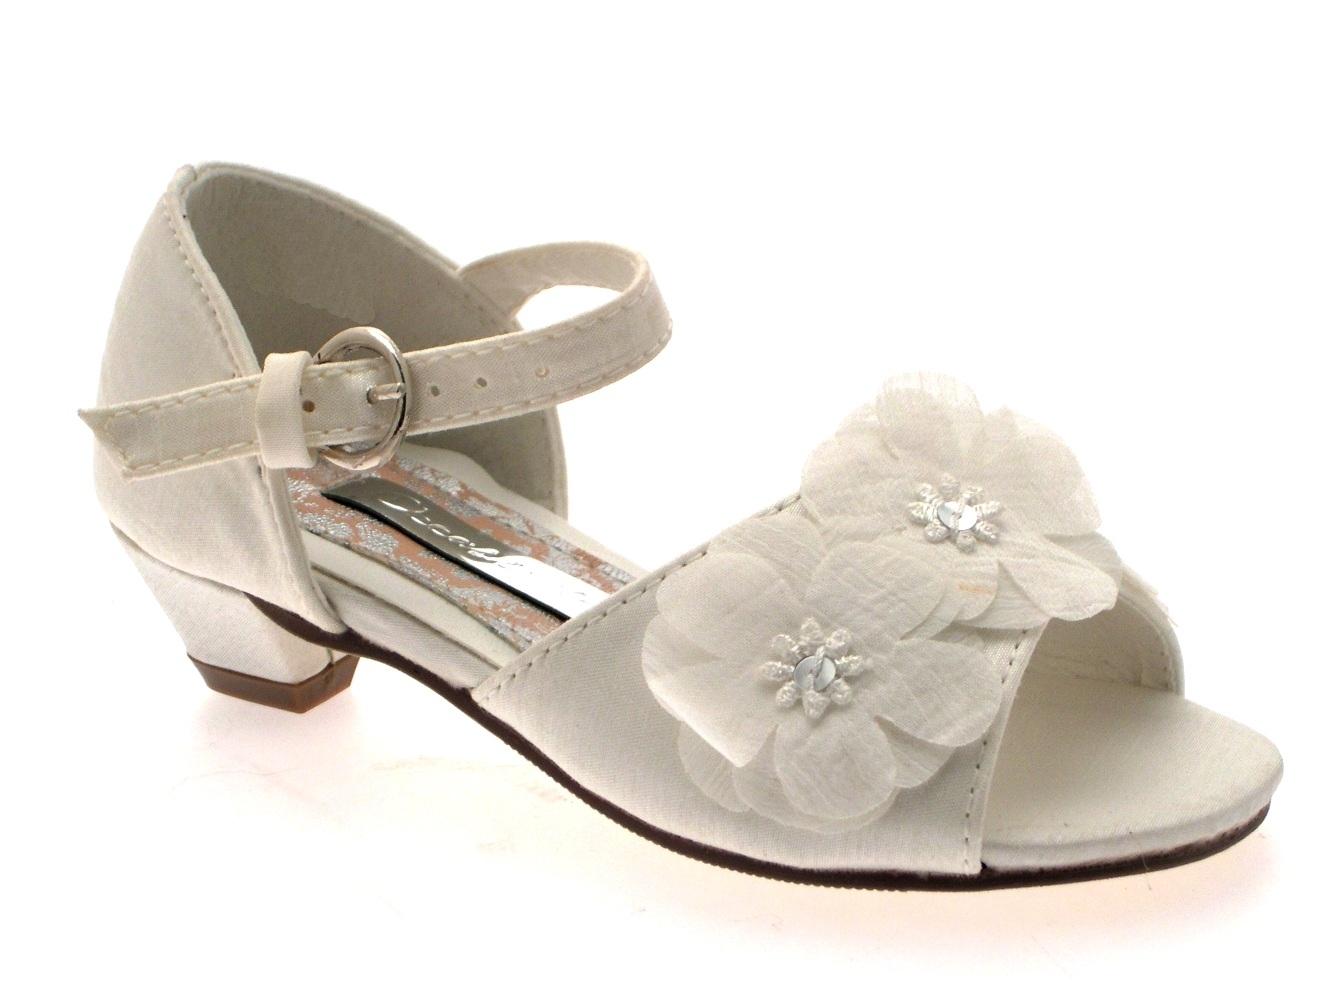 GIRLS KIDS SATIN FLOWER WEDDING BRIDAL BRIDESMAID IVORY CREAM SHOES SANDALS 6 2